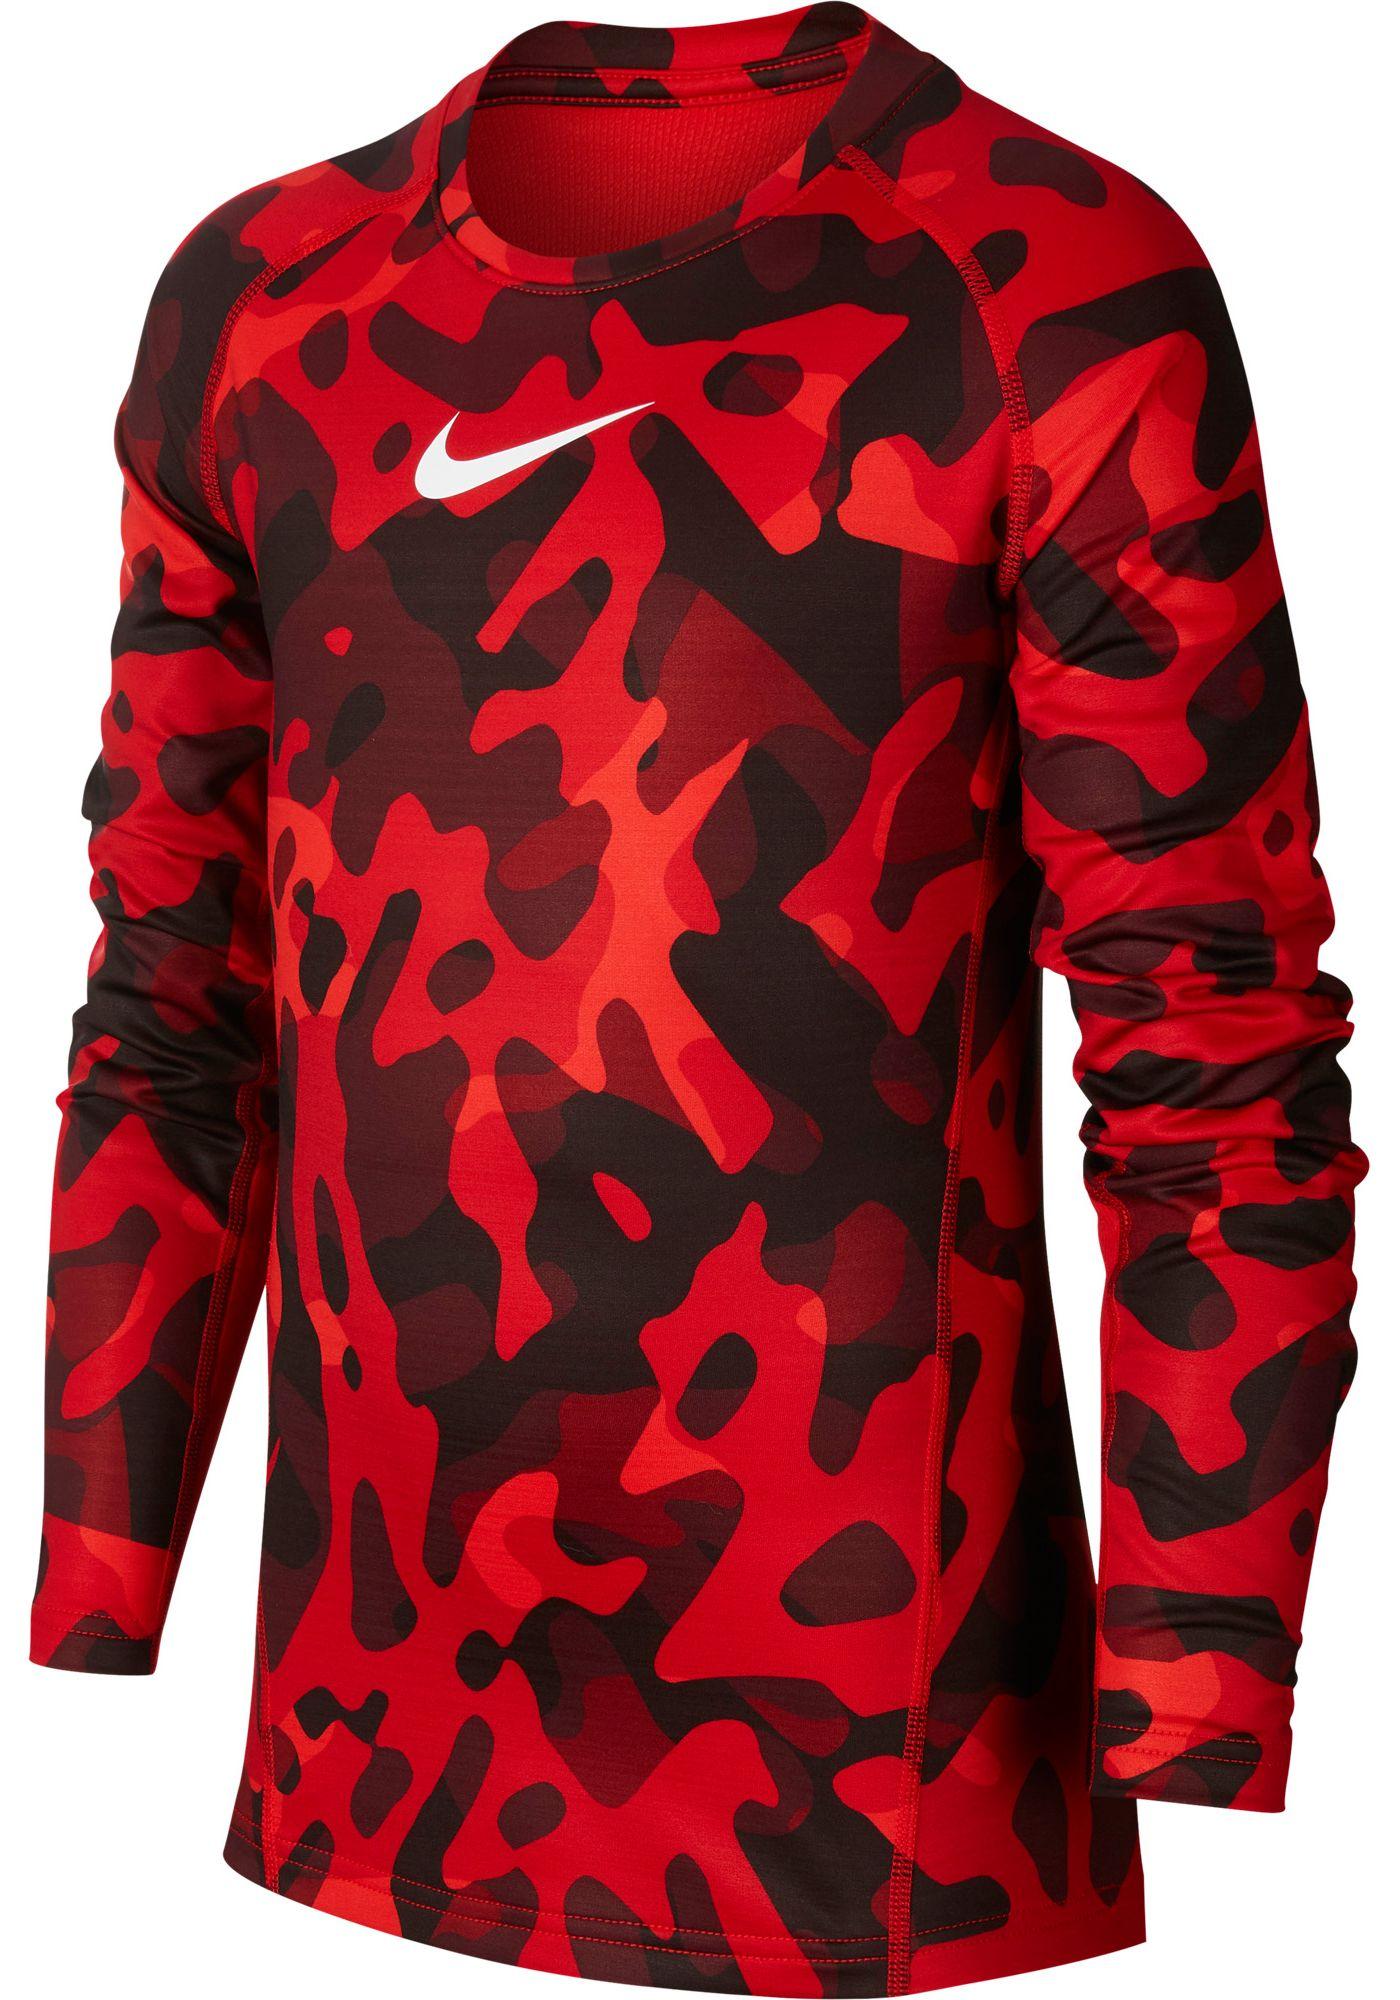 Nike Pro Boy's Printed Therma Long Sleeve Shirt